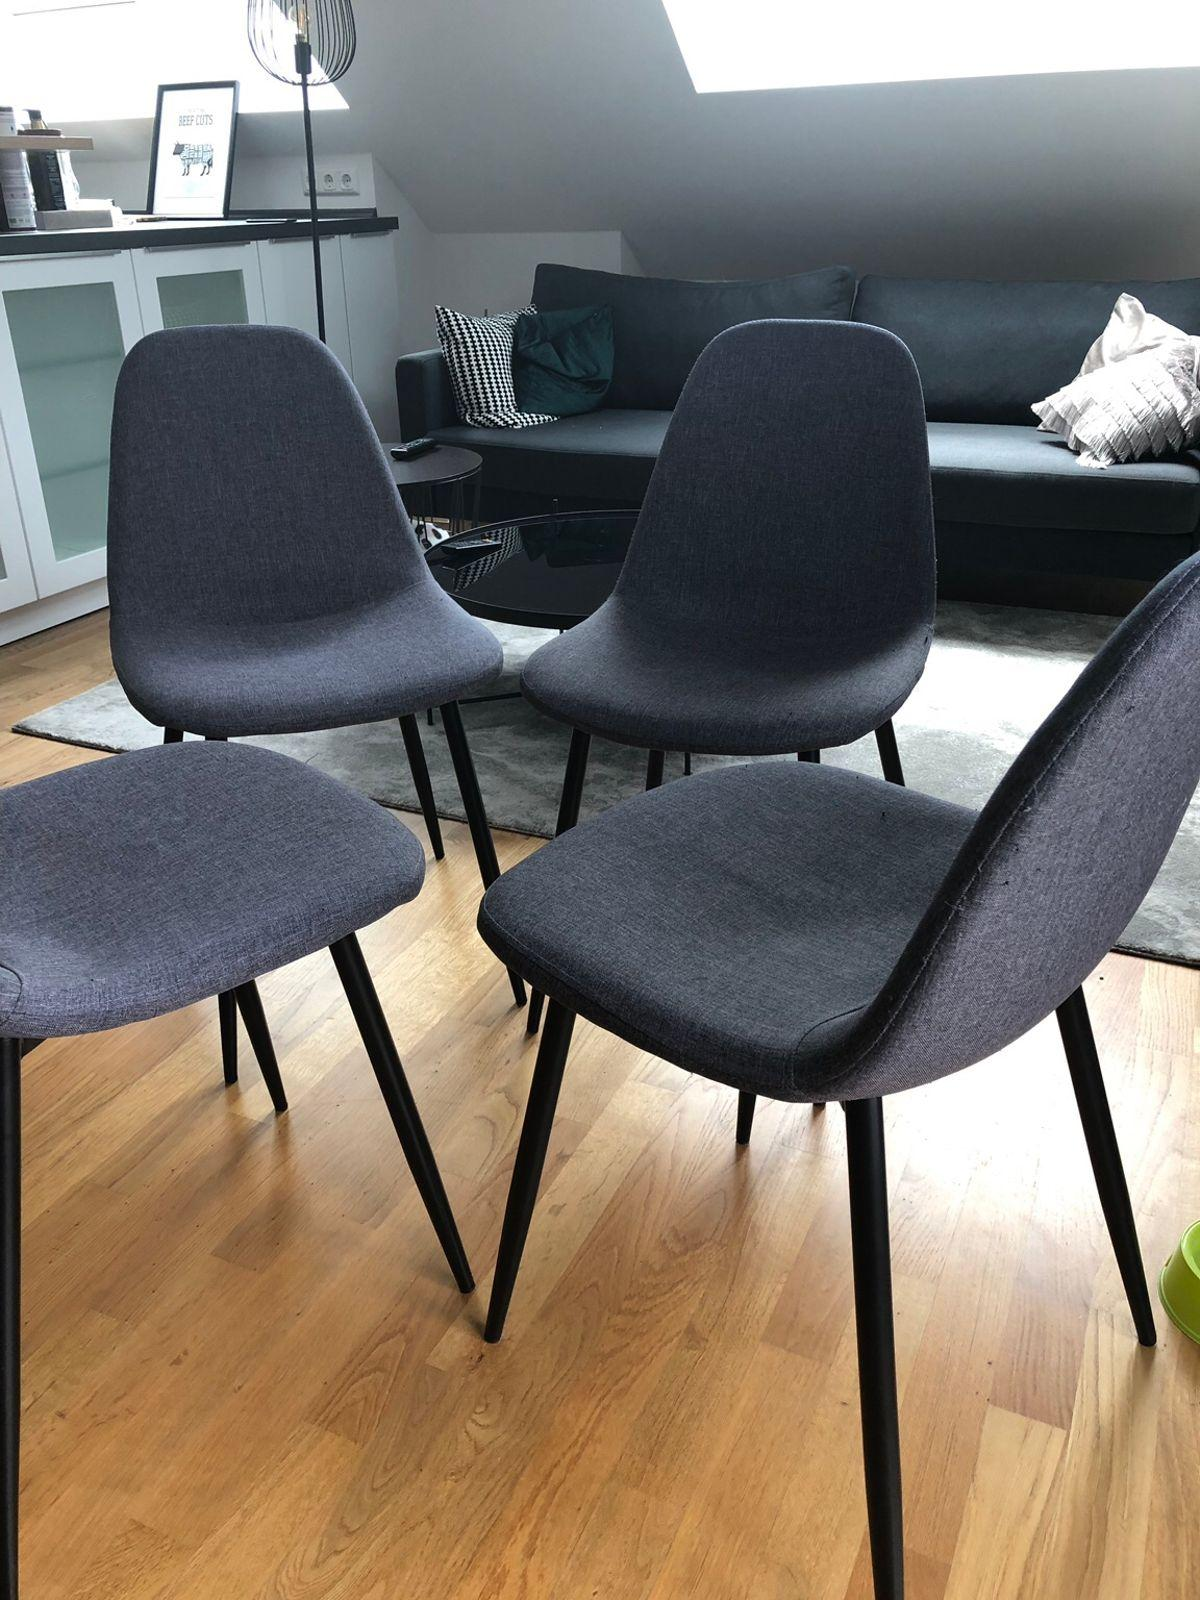 Stuhl Grau Schwarze Beine